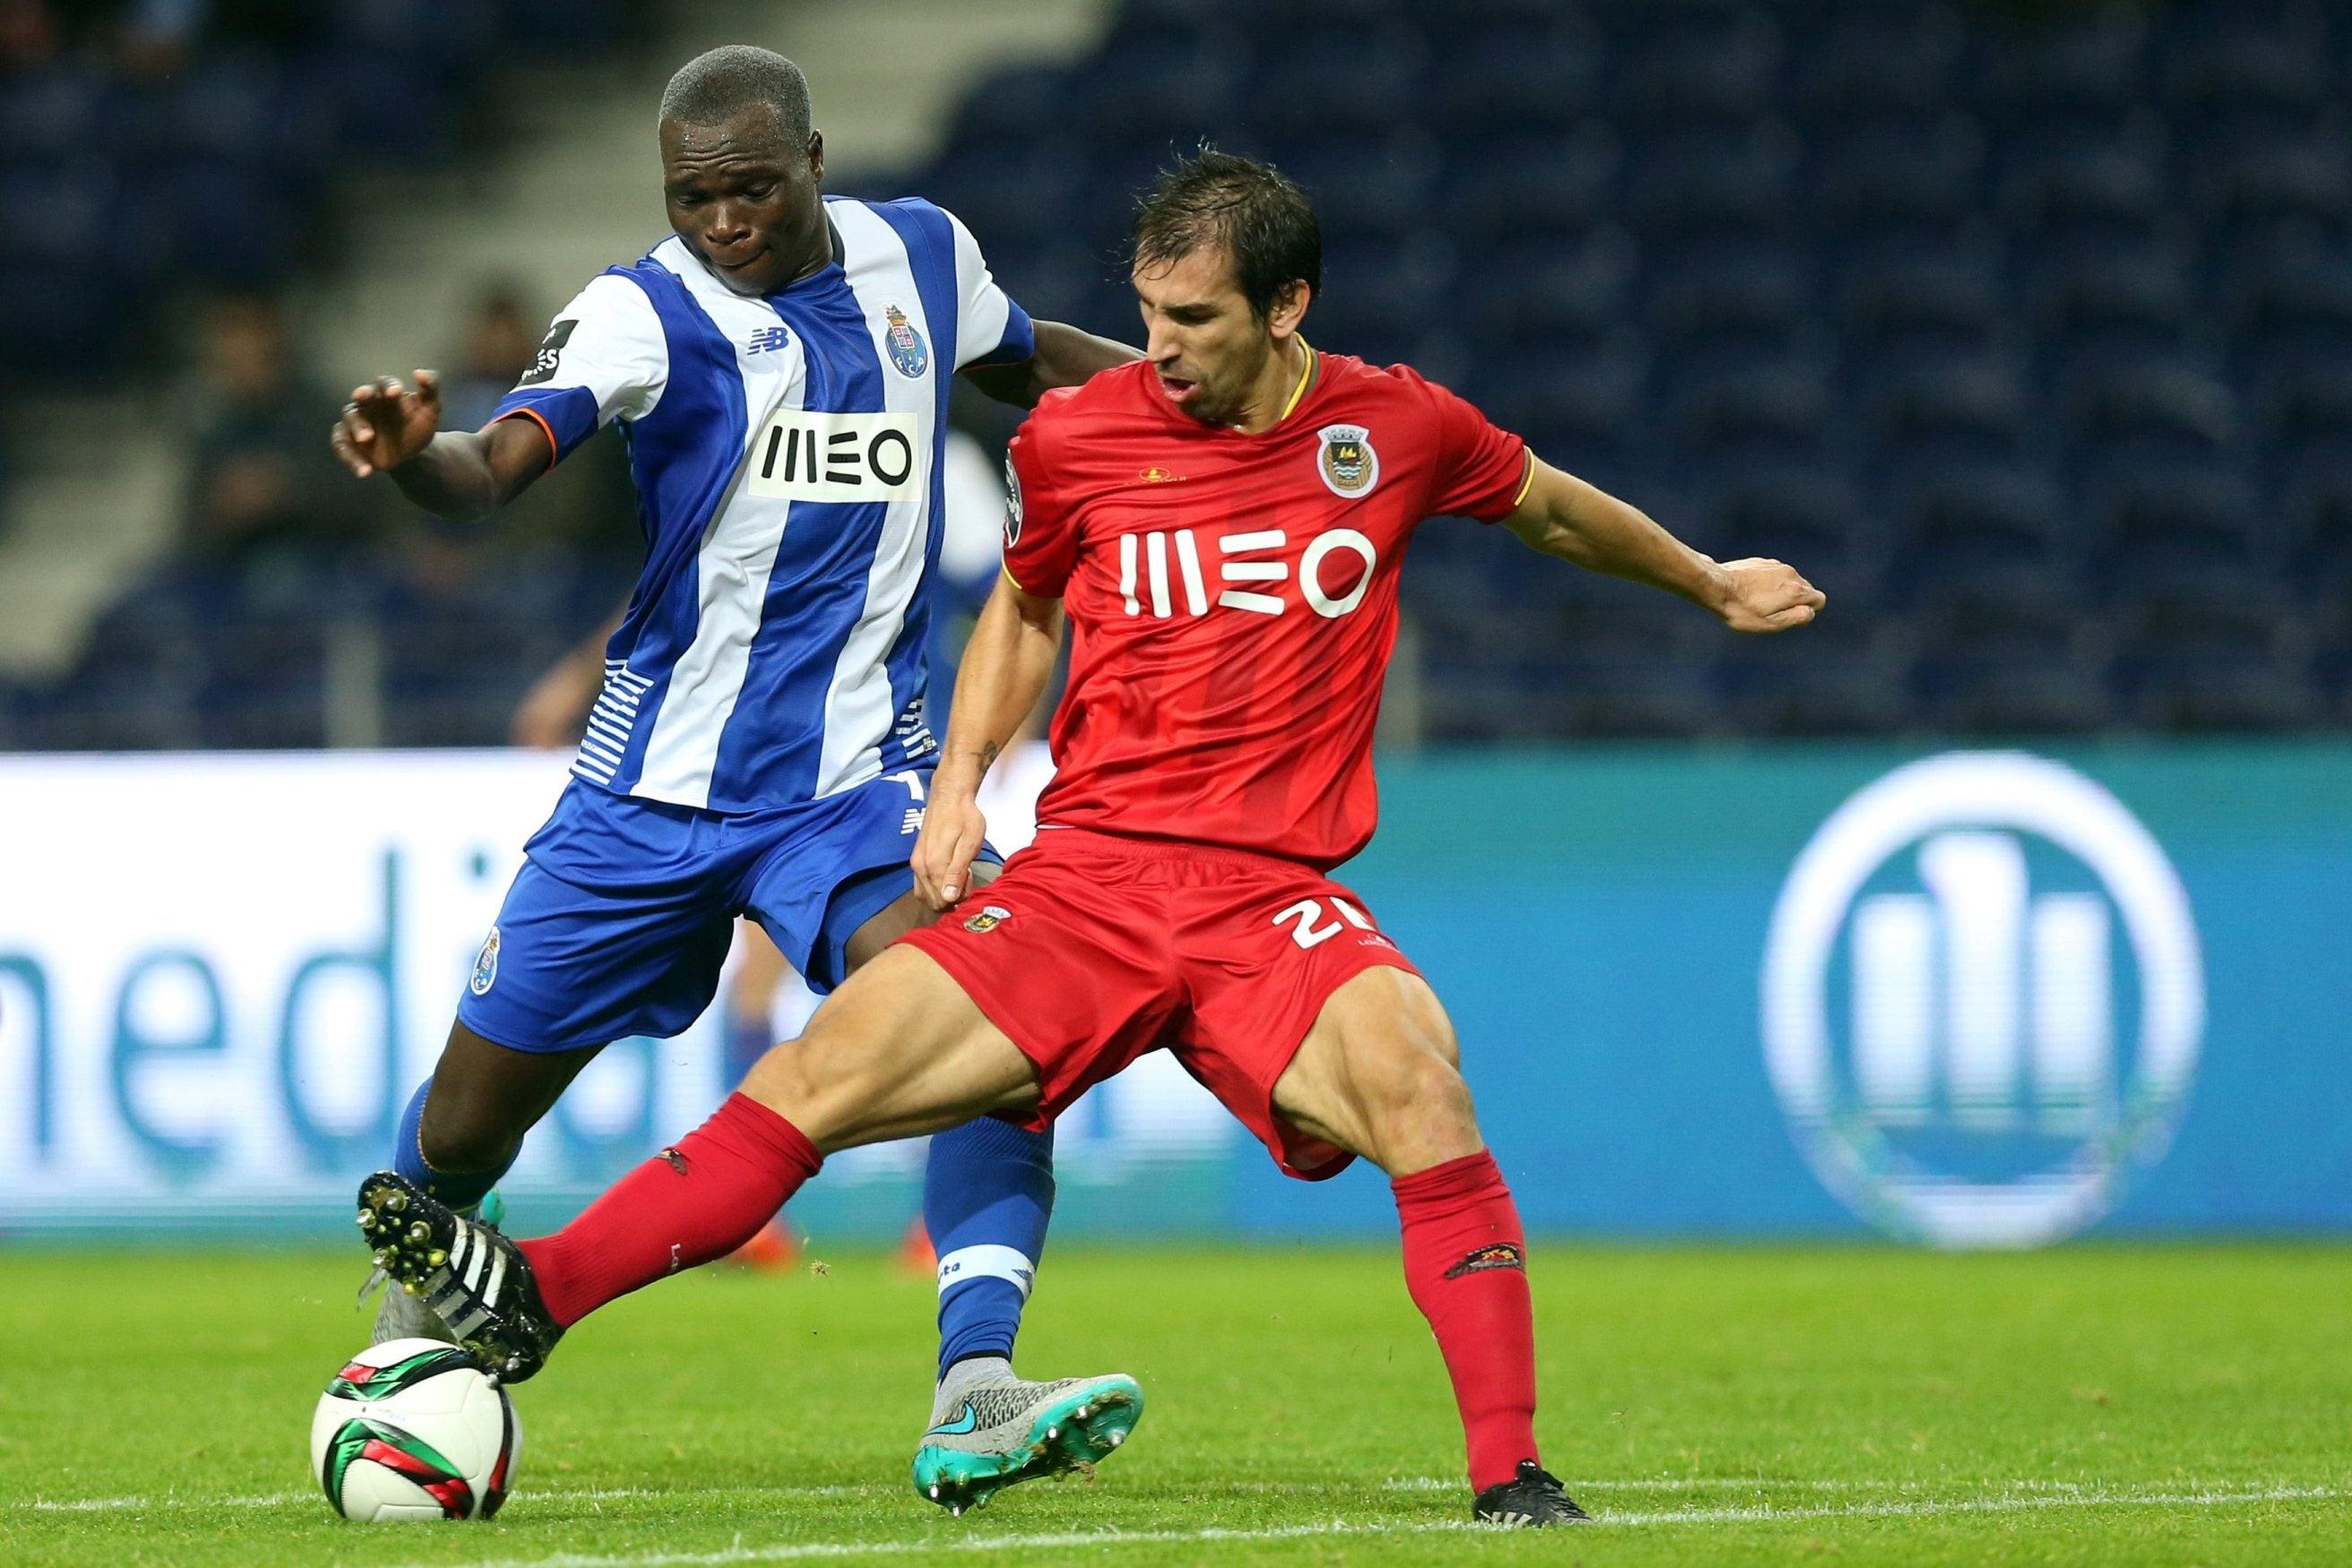 Resultado final: FC Porto - Rio Ave, 3-0